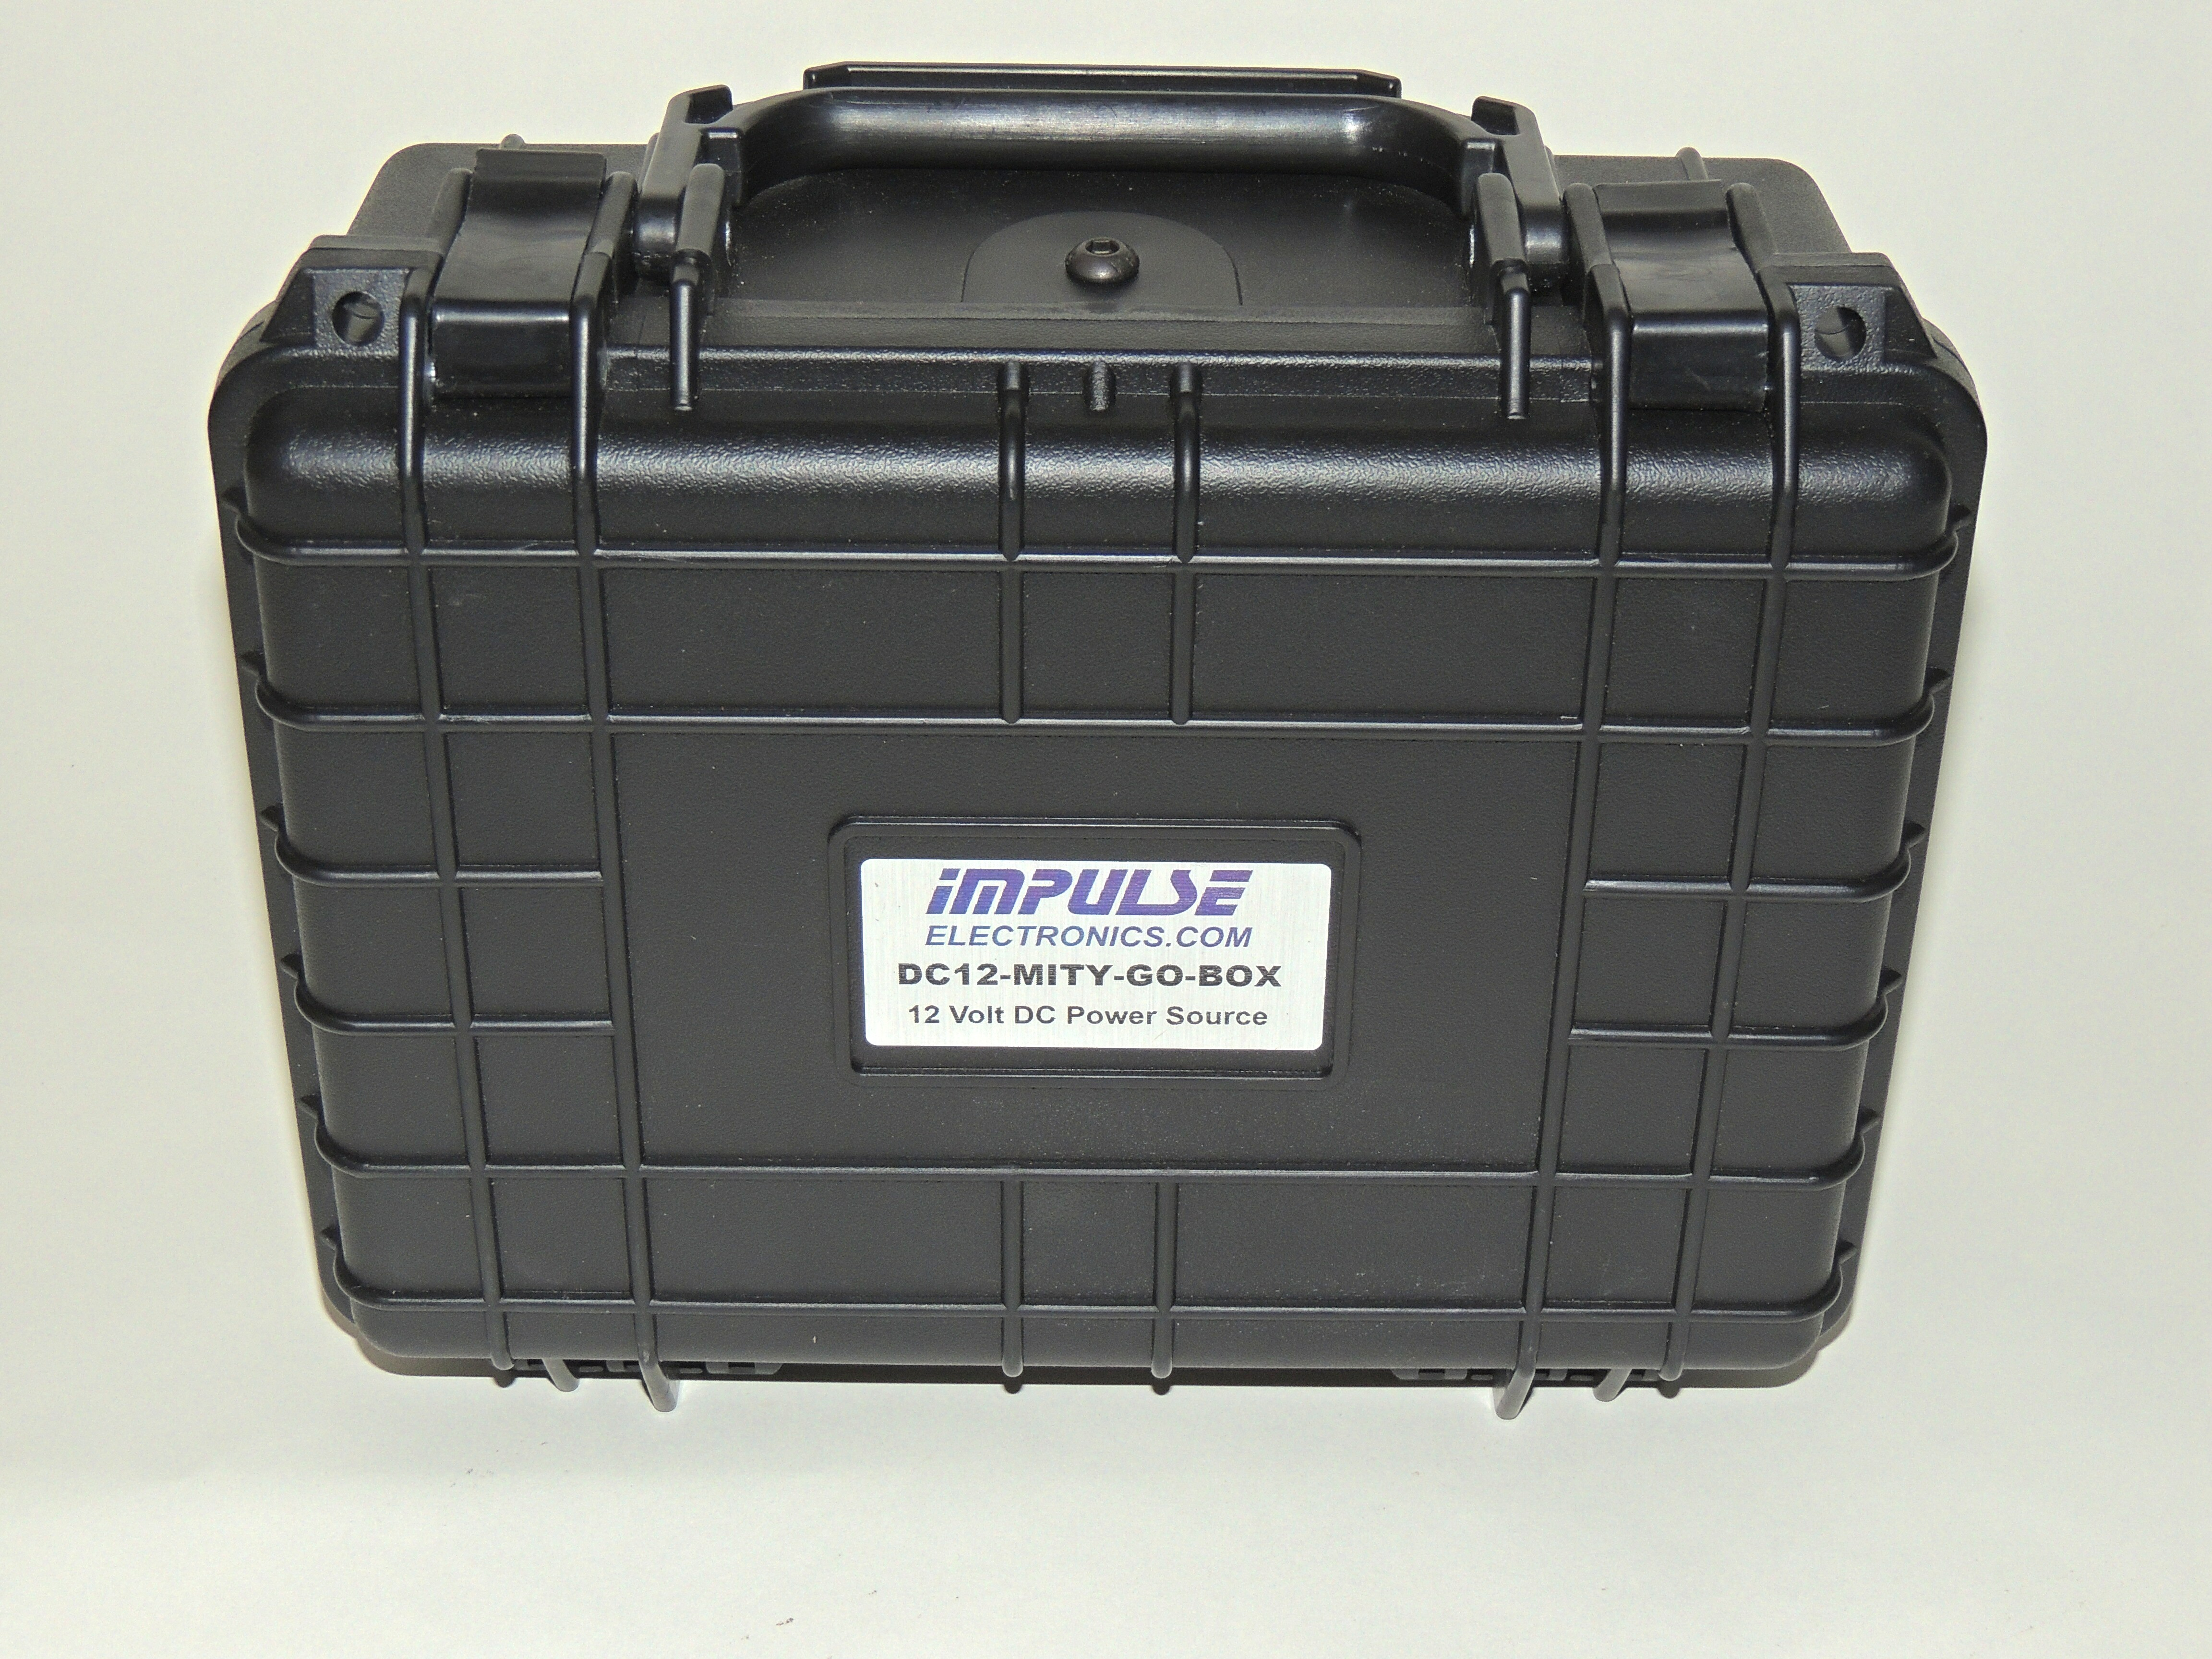 DC12-MITY-GO-BOX